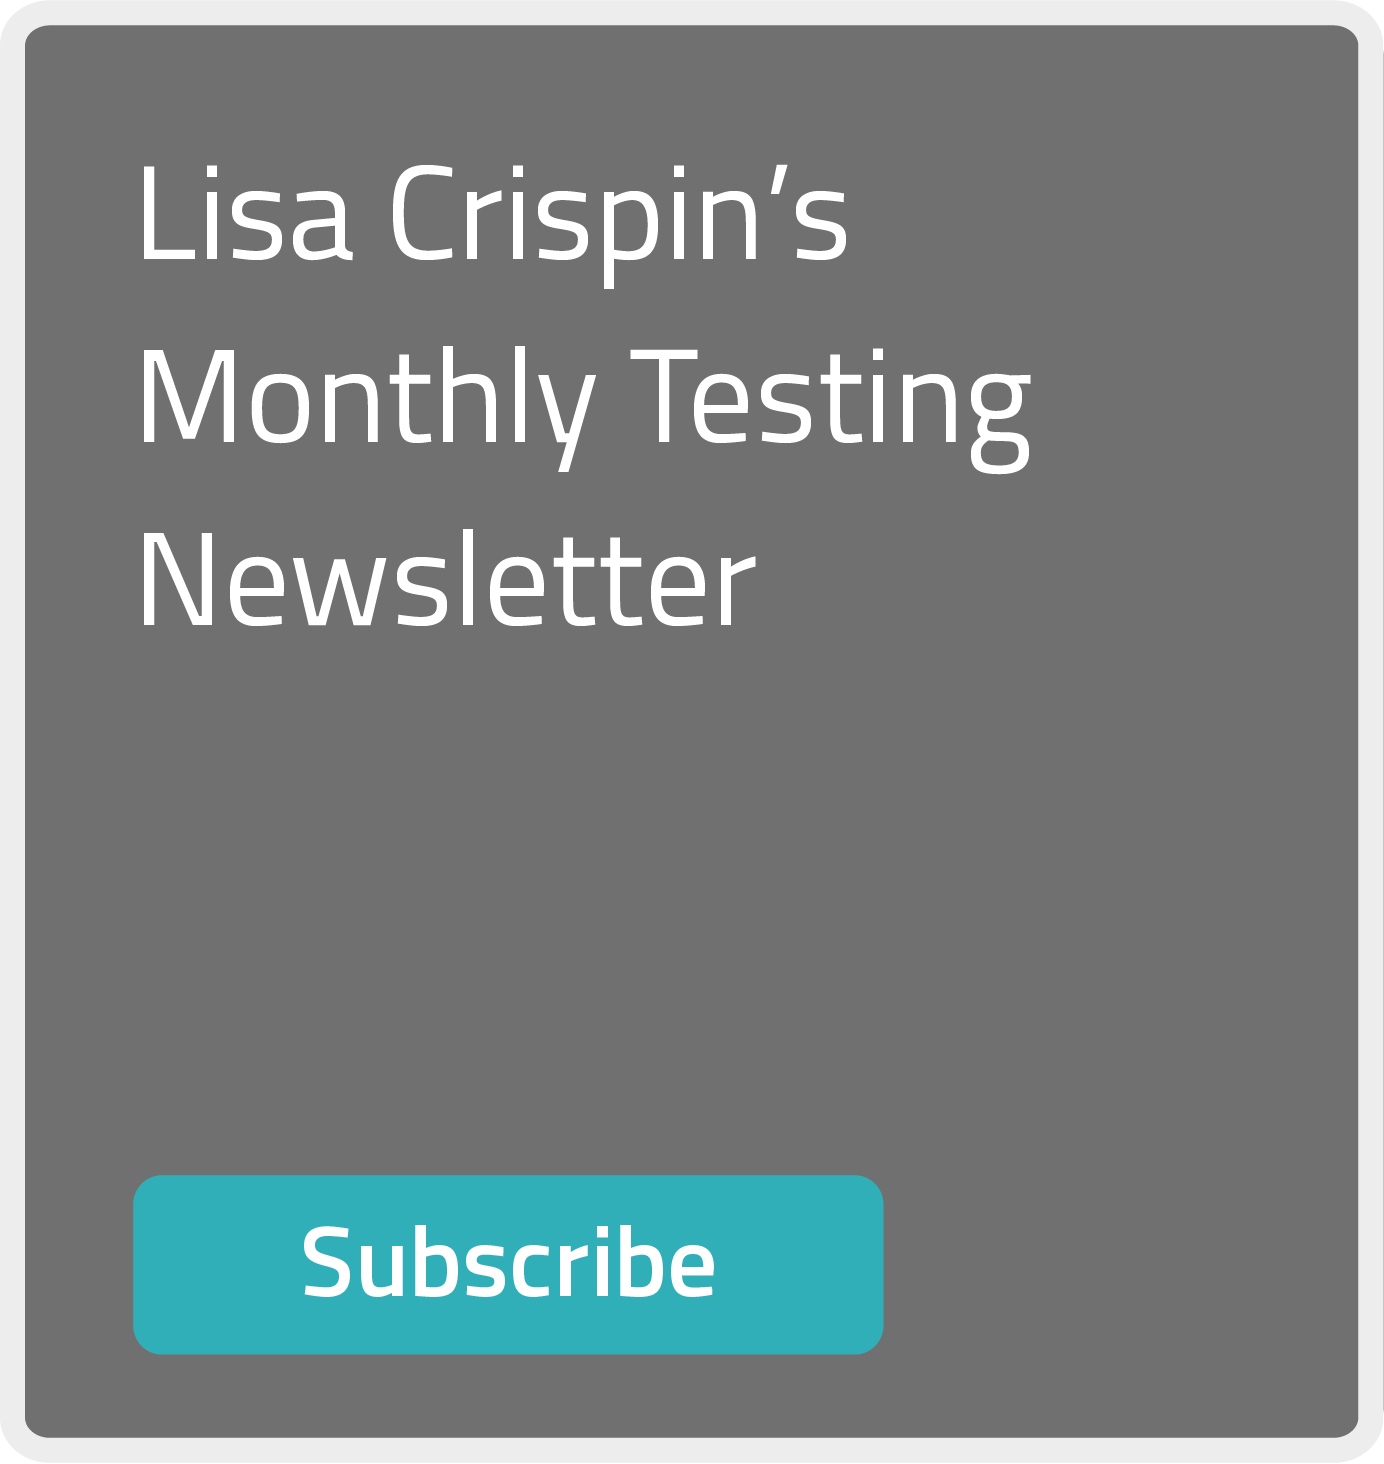 LisaCrispinNewsletterBoxHomePage-01-01